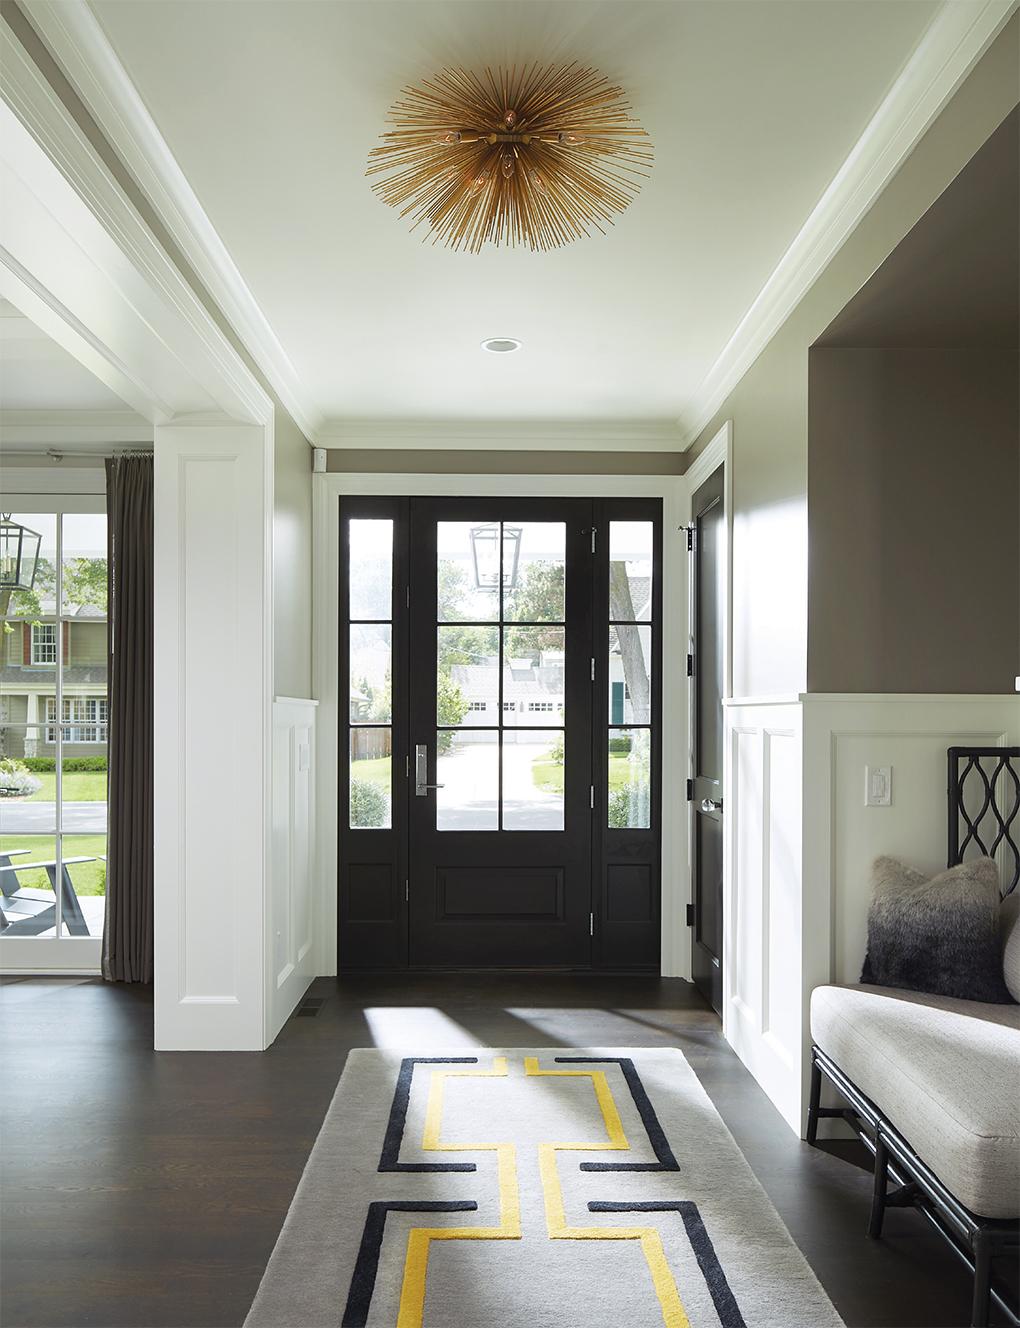 A modern foyer of a home.